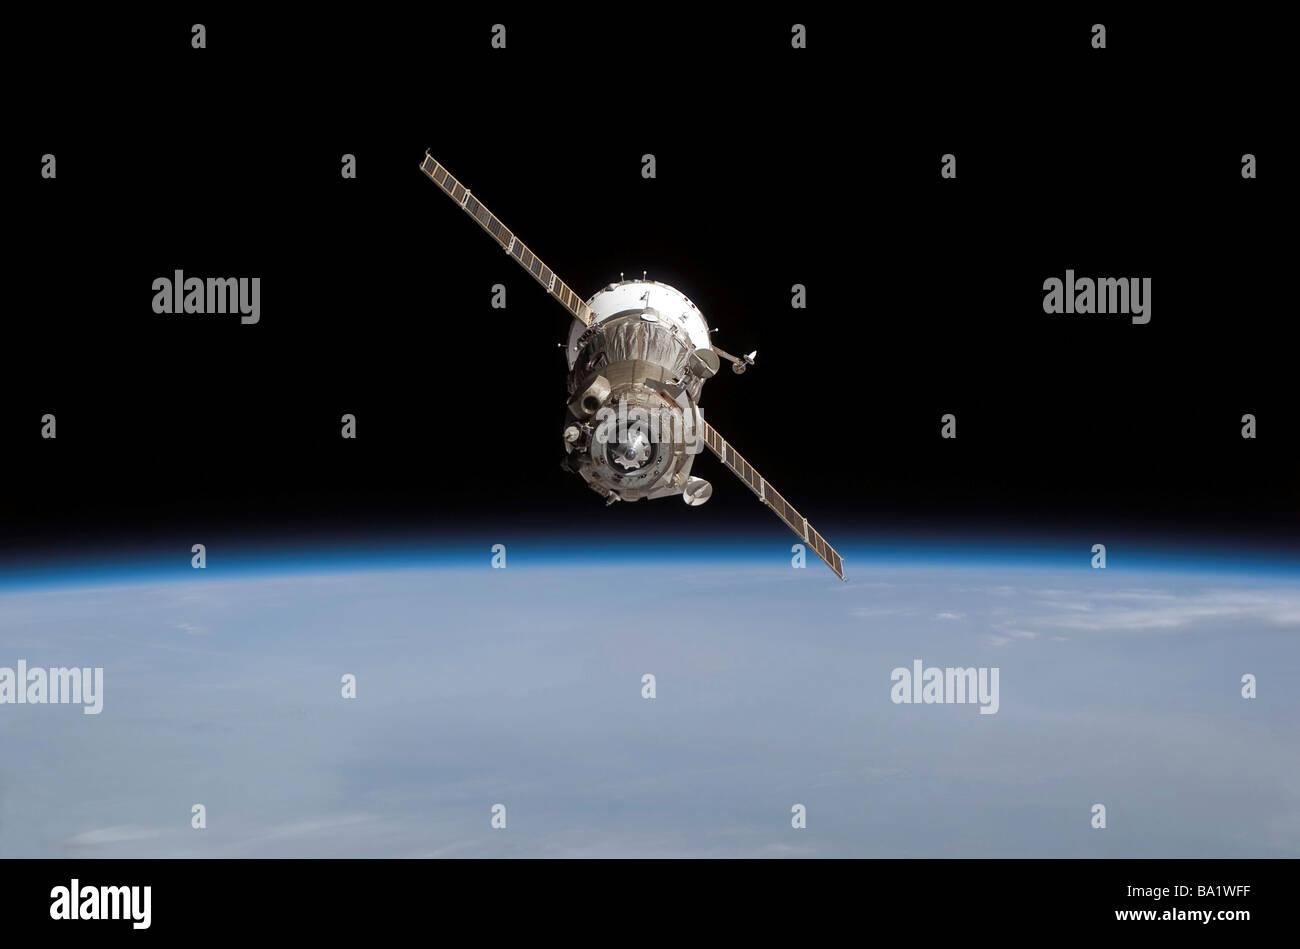 The Soyuz TMA-11 spacecraft above Earth's horizon. - Stock Image